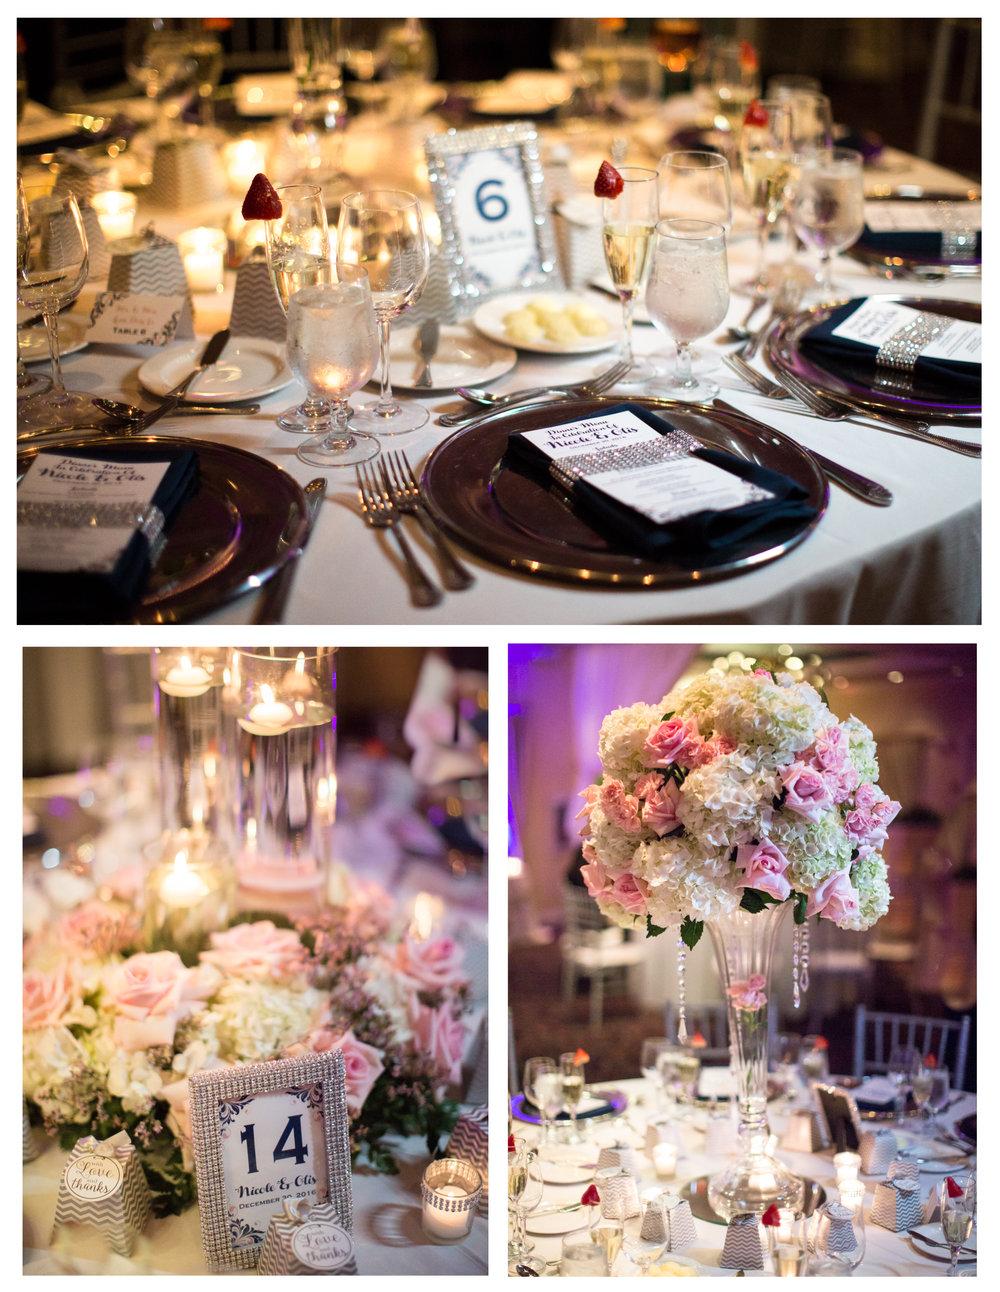 Benvenuto_wedding_Boynton_Beach_Jodi_Fjelde_Photography_Nikki_Otis_married_20.jpg